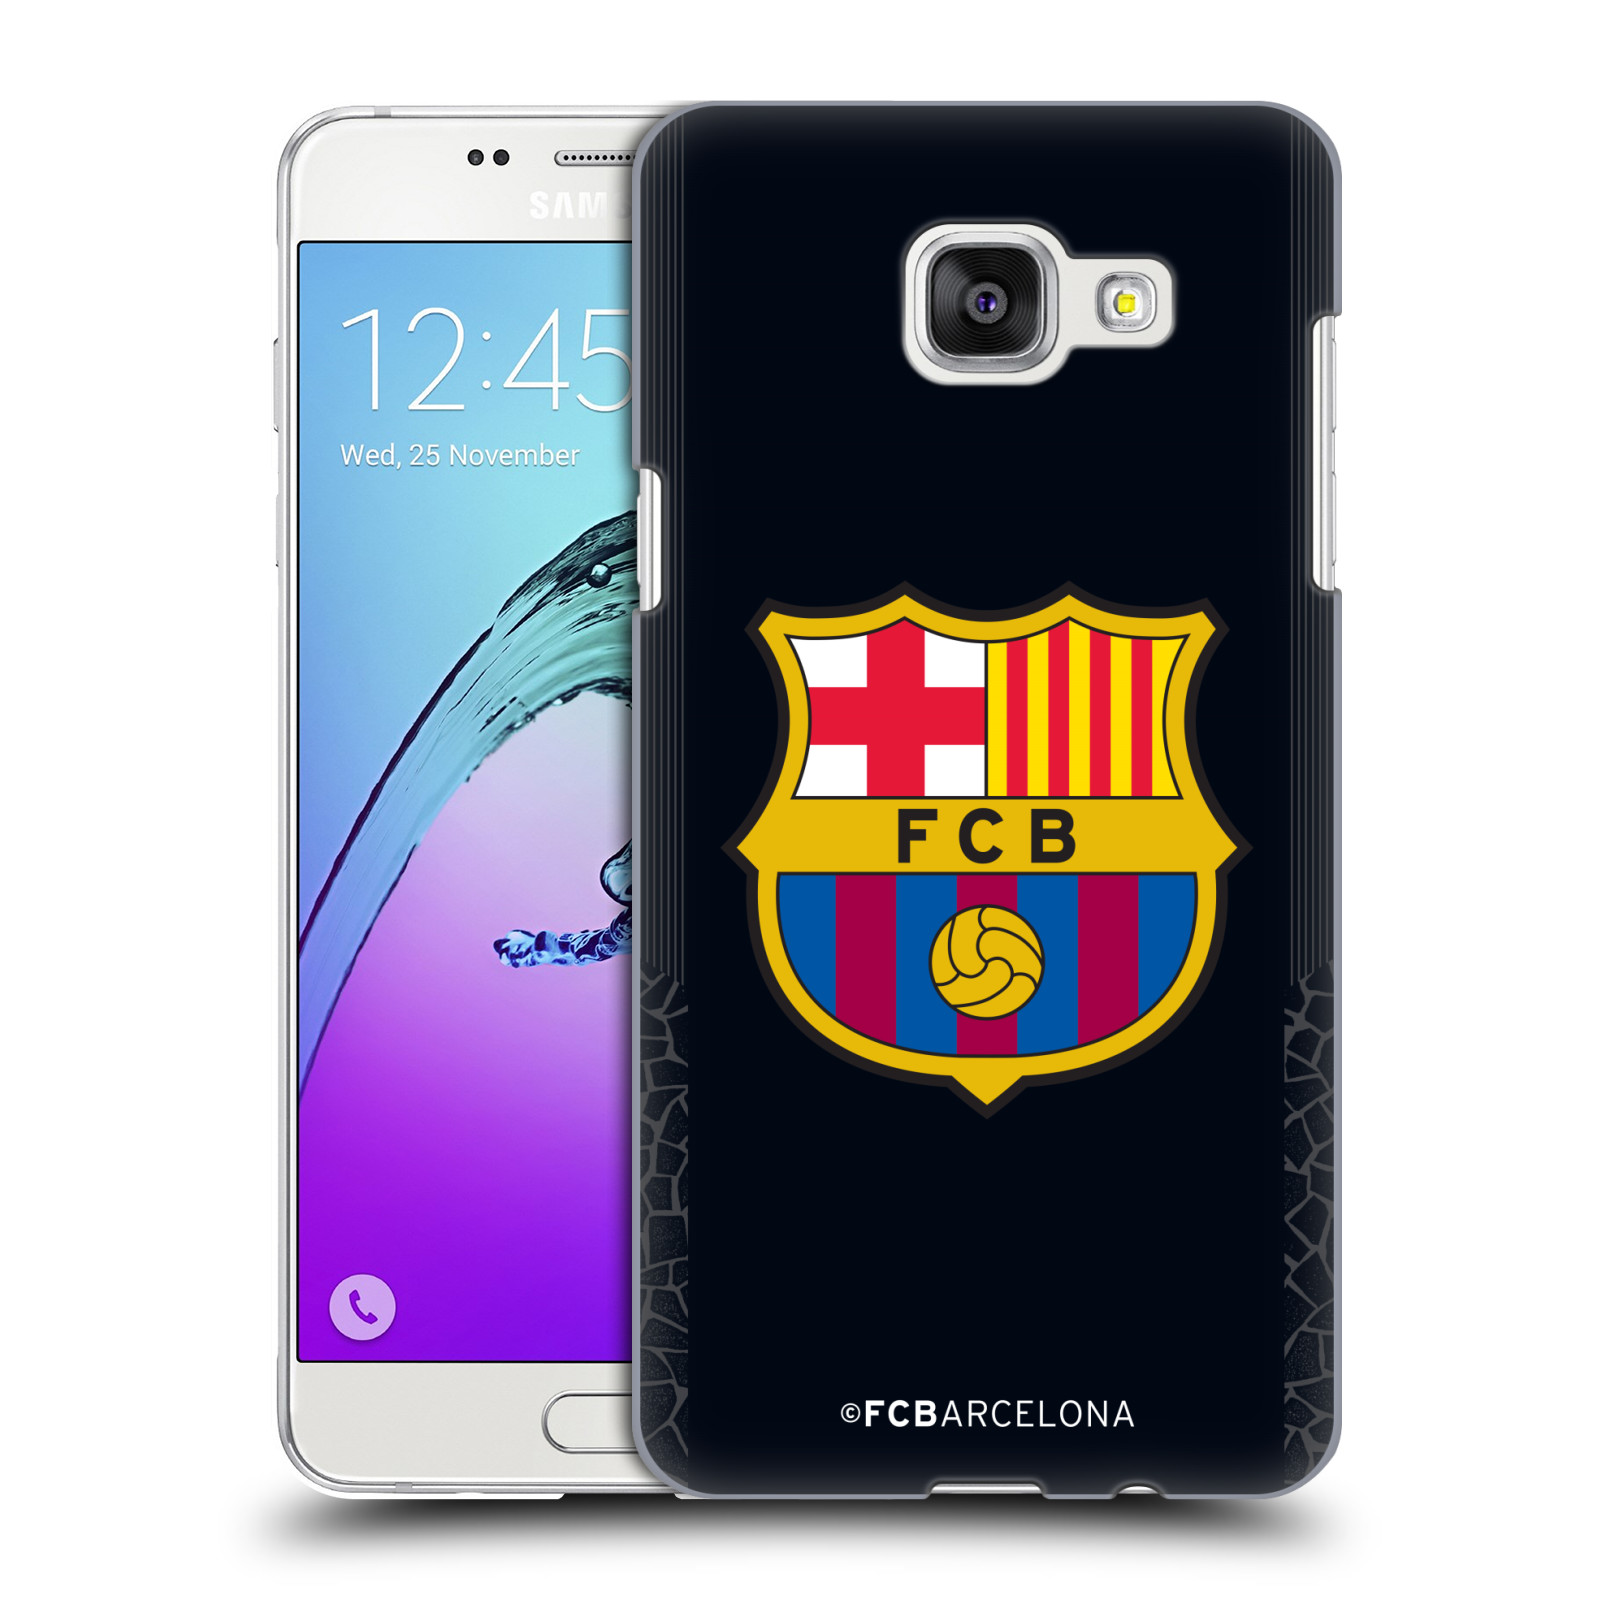 Plastové pouzdro na mobil Samsung Galaxy A5 (2016) - Head Case - FC Barcelona - Goalkeeper black logo